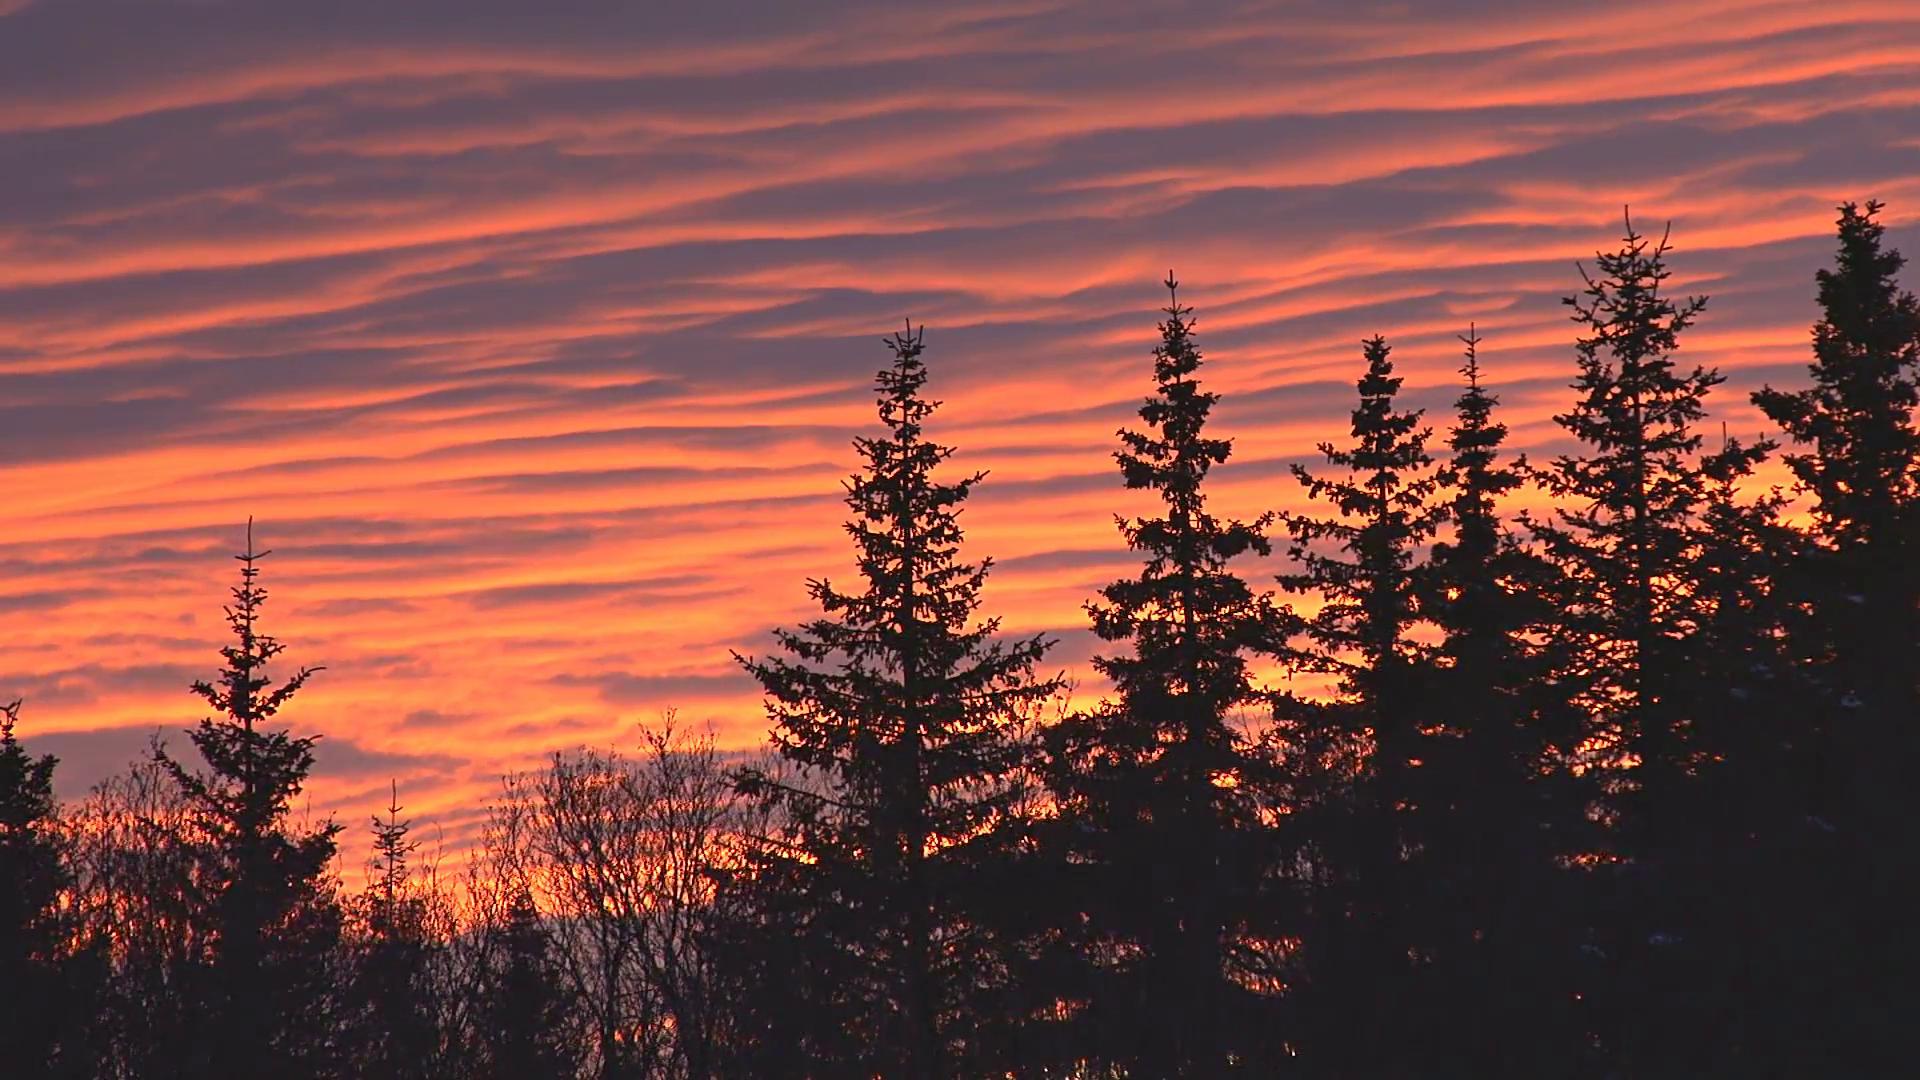 Dark Forest Silhouette Sunset 2 Stock Video Footage - Videoblocks